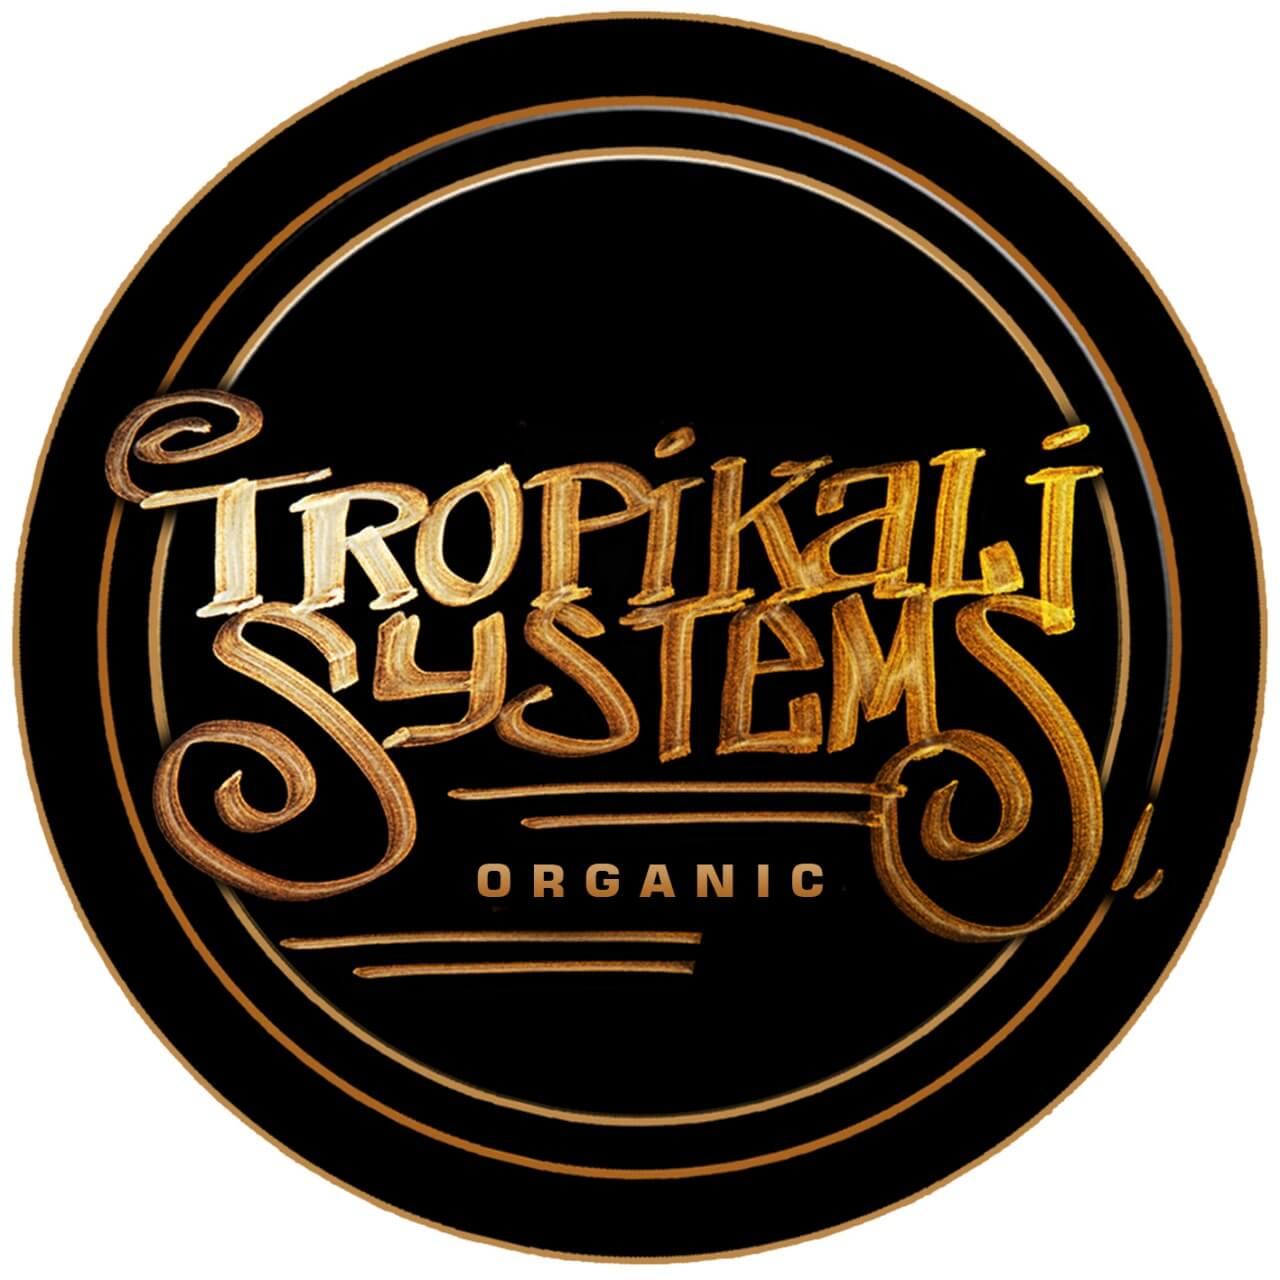 tropikali systems - organic